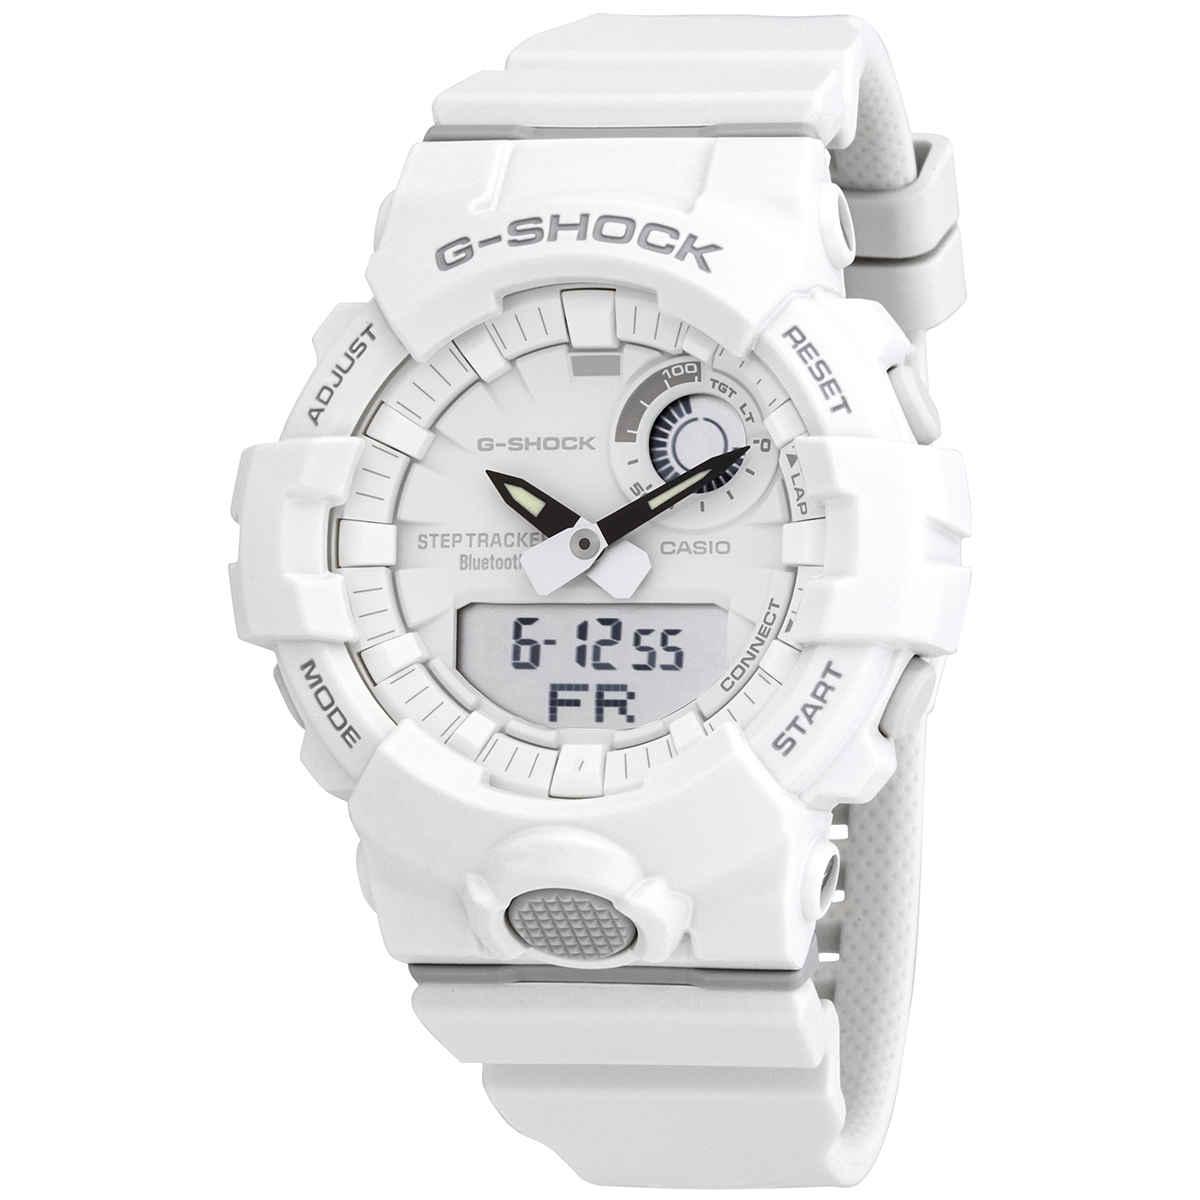 dc1e17fe9ec Casio G-Shock Men s Analog-Digital Watch GBA800-7A 4549526179242